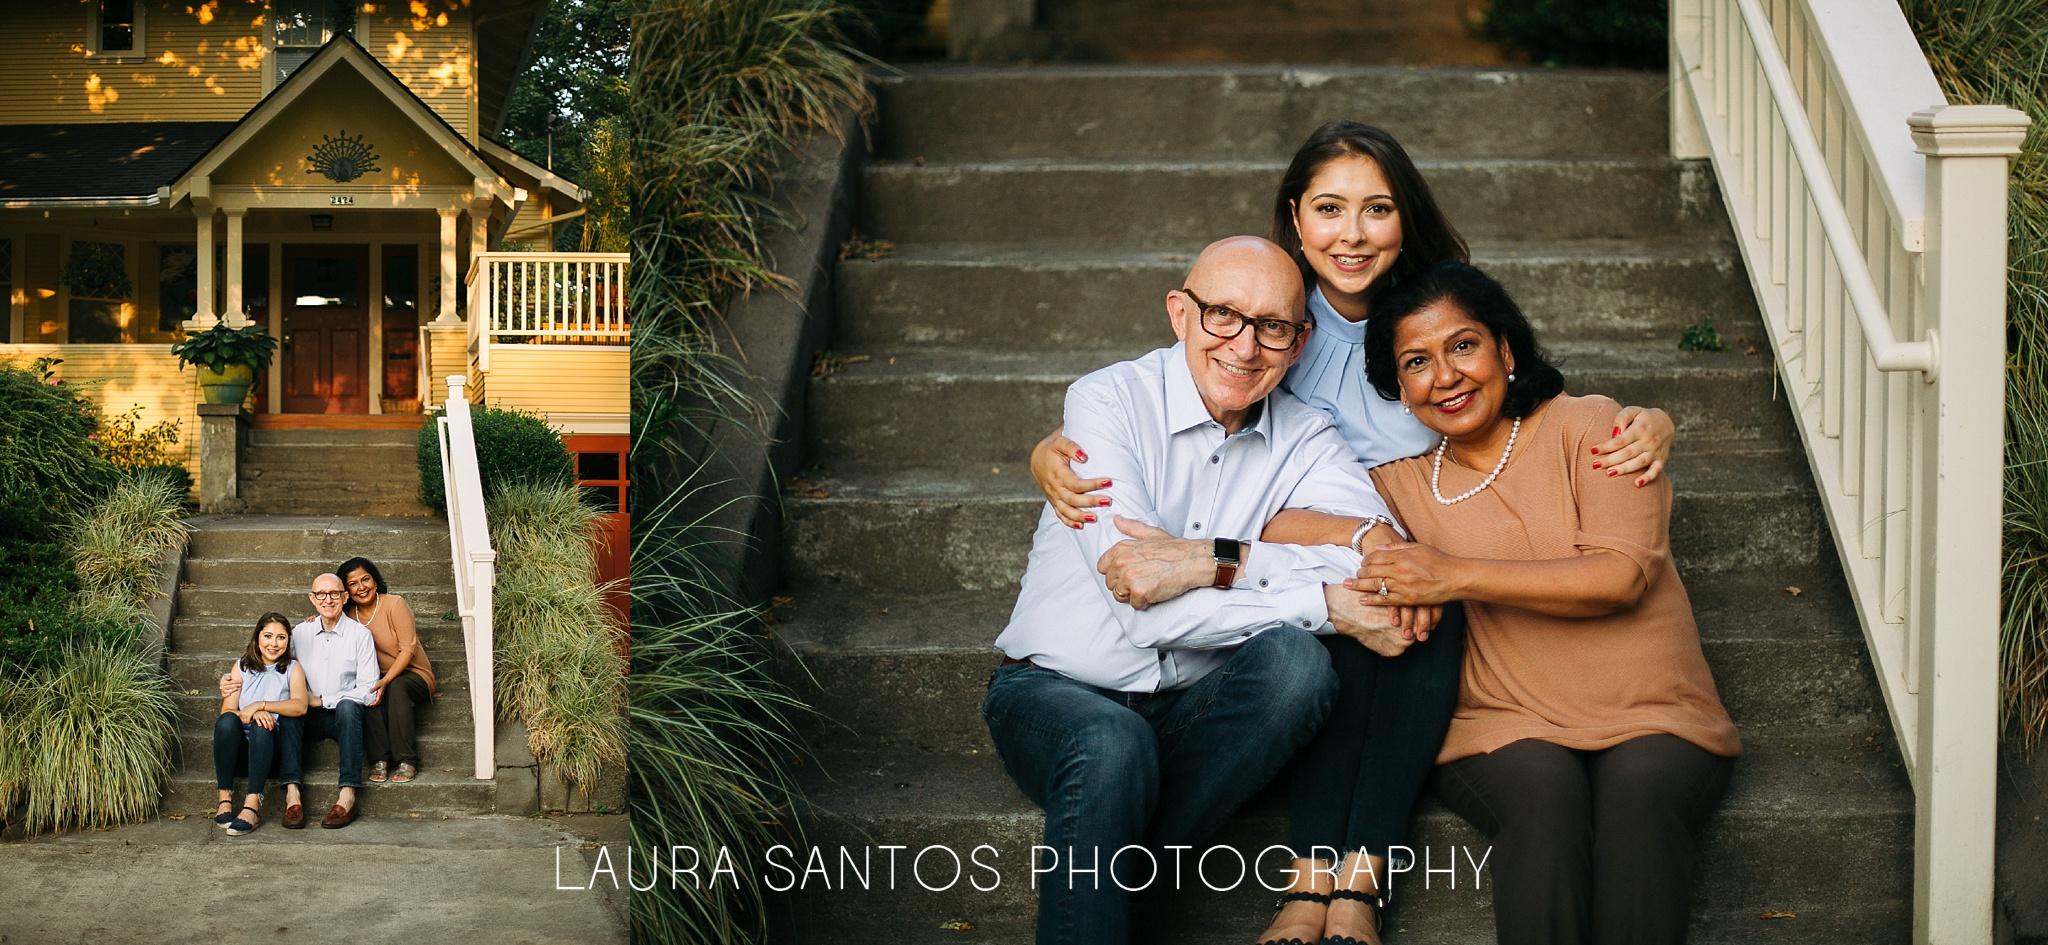 Laura Santos Photography Portland Oregon Family Photographer_0427.jpg